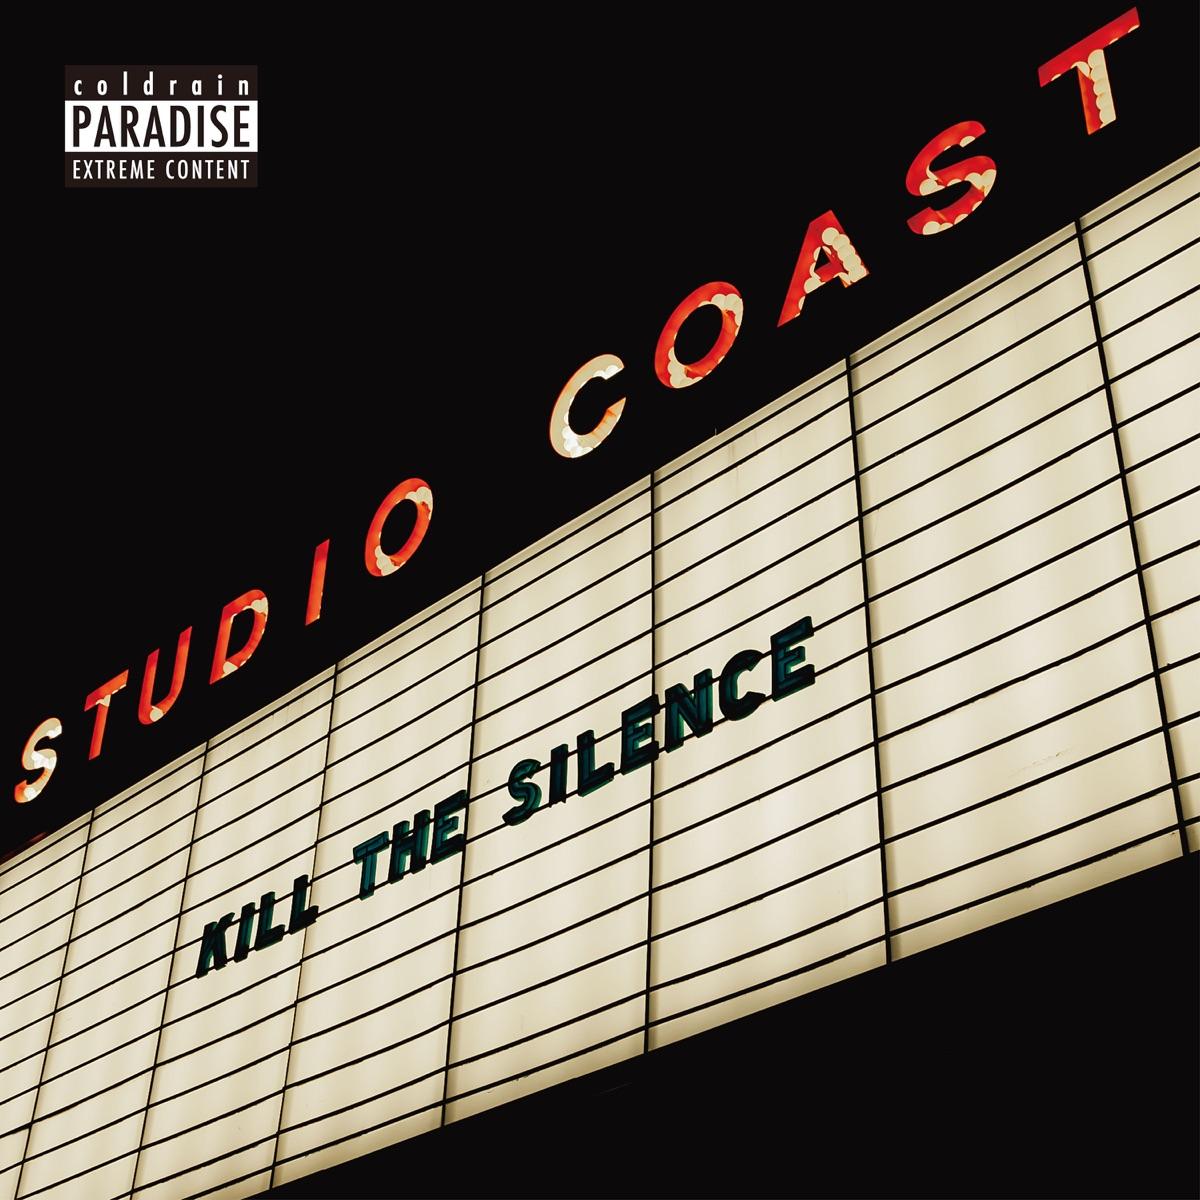 『coldrain - PARADISE (Kill The Silence)』収録の『PARADISE (Kill The Silence)』ジャケット